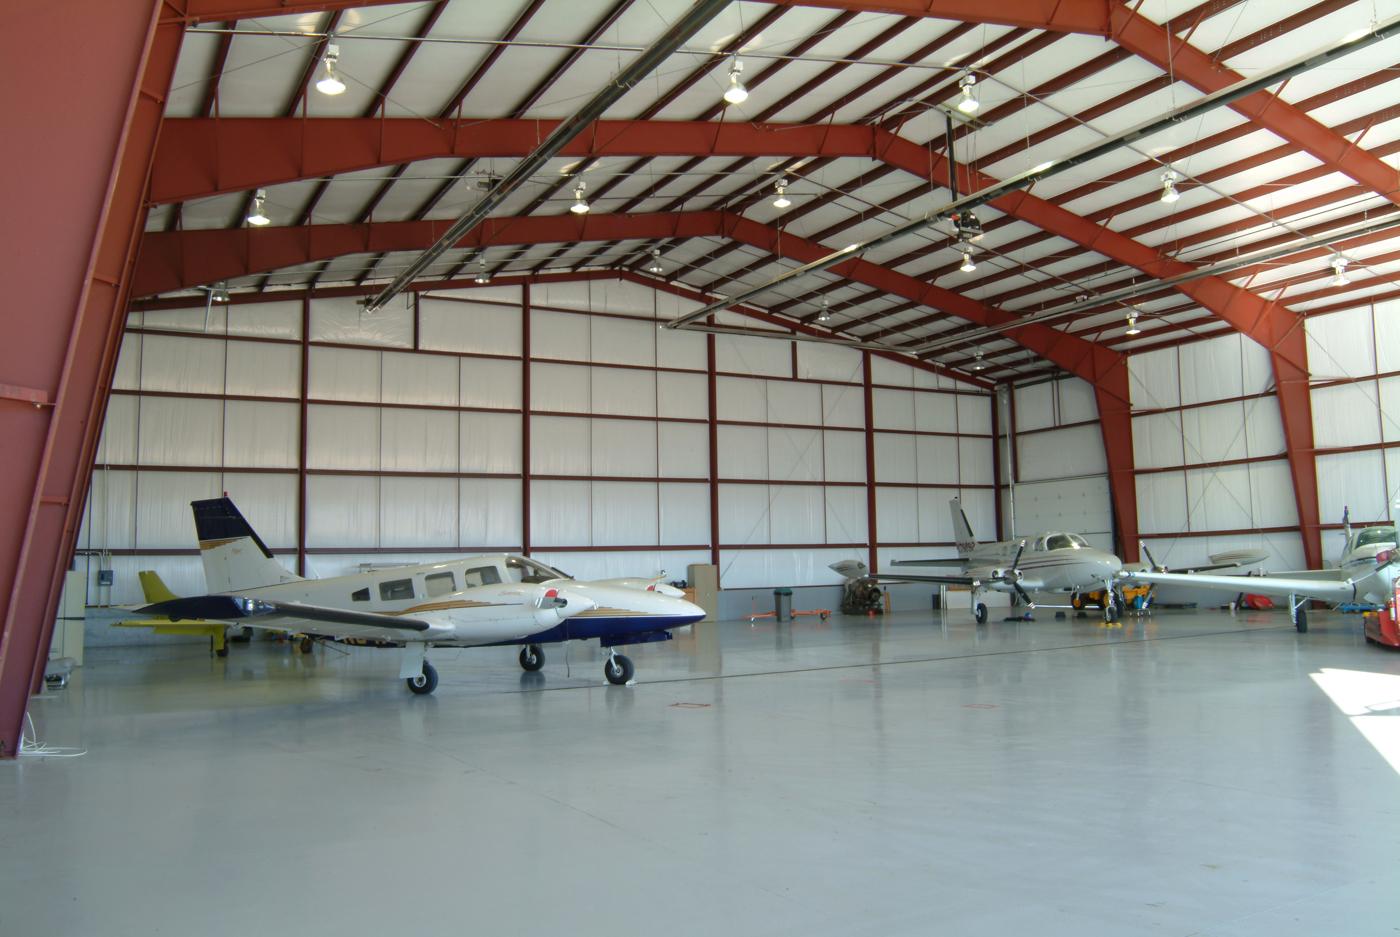 Steel Aviation Hangars Newcore Global Pvt Ltd